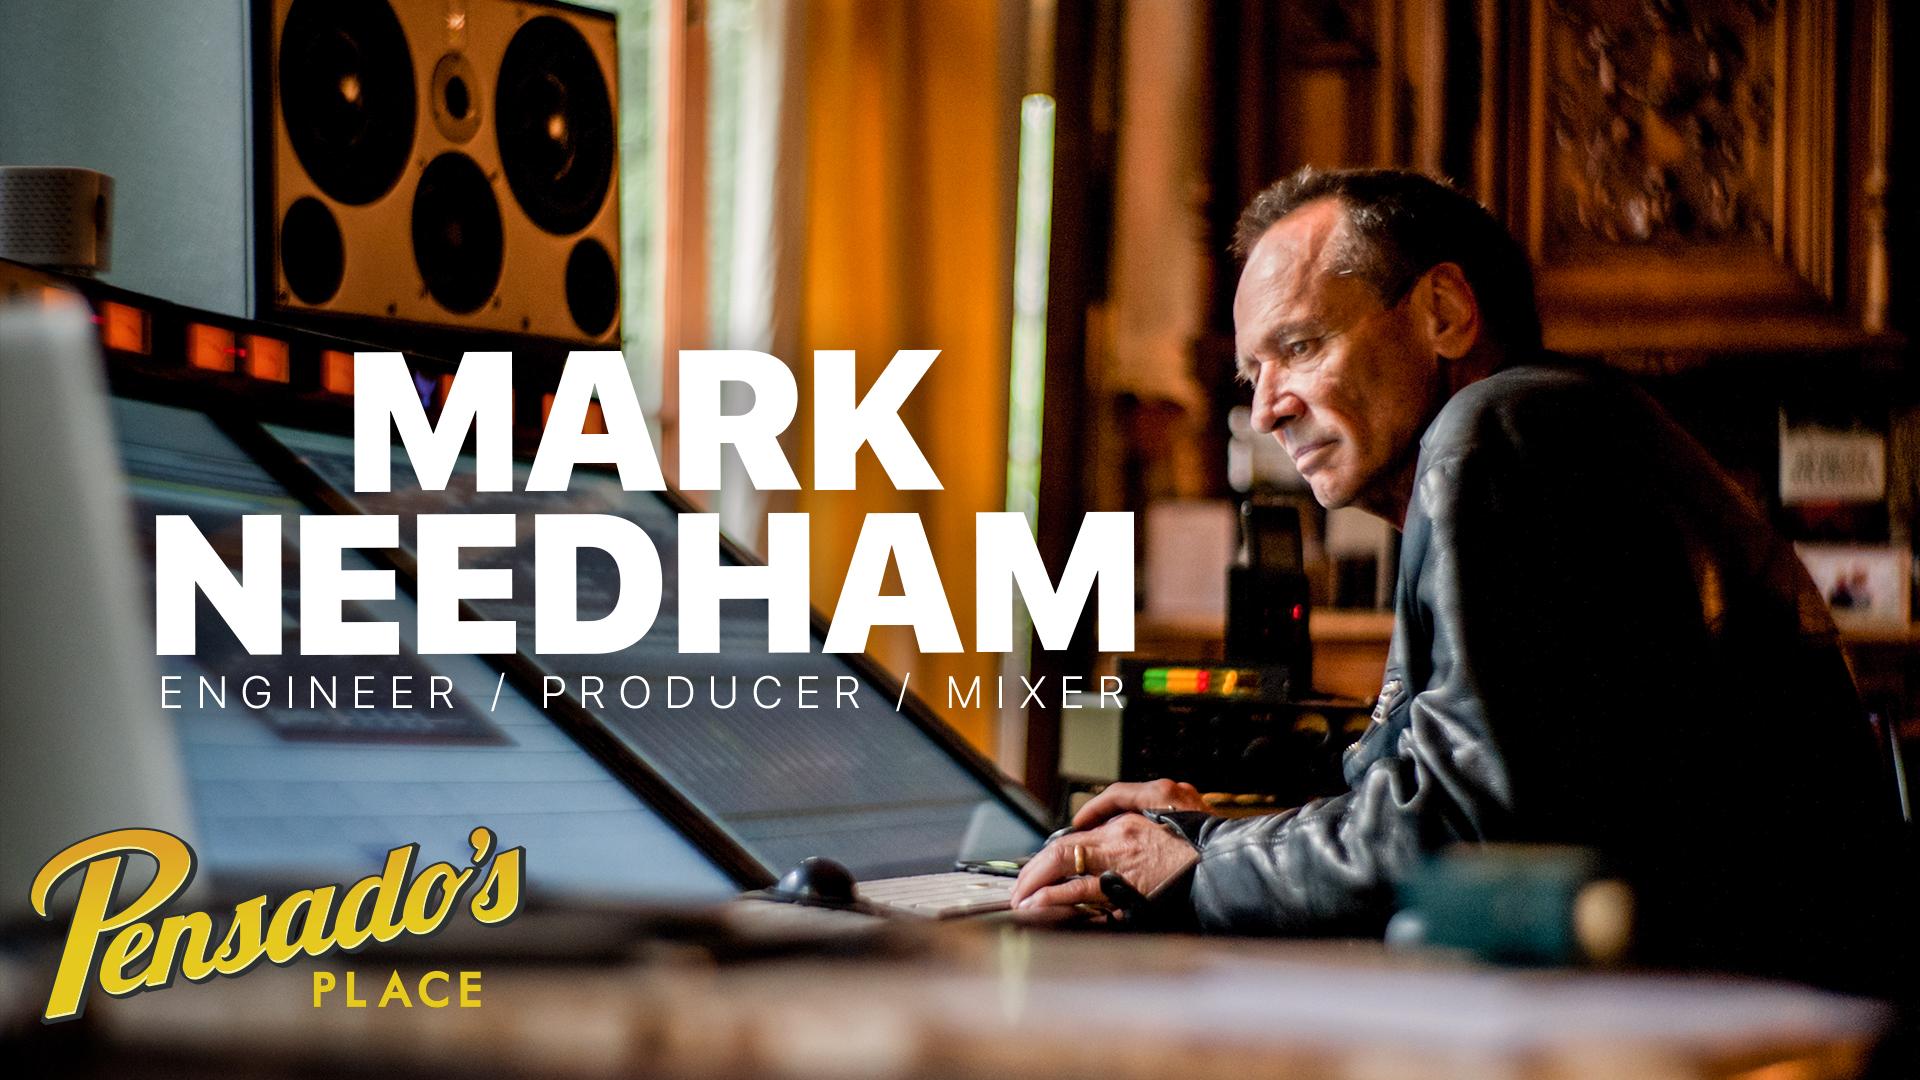 Engineer / Producer / Mixer, Mark Needham